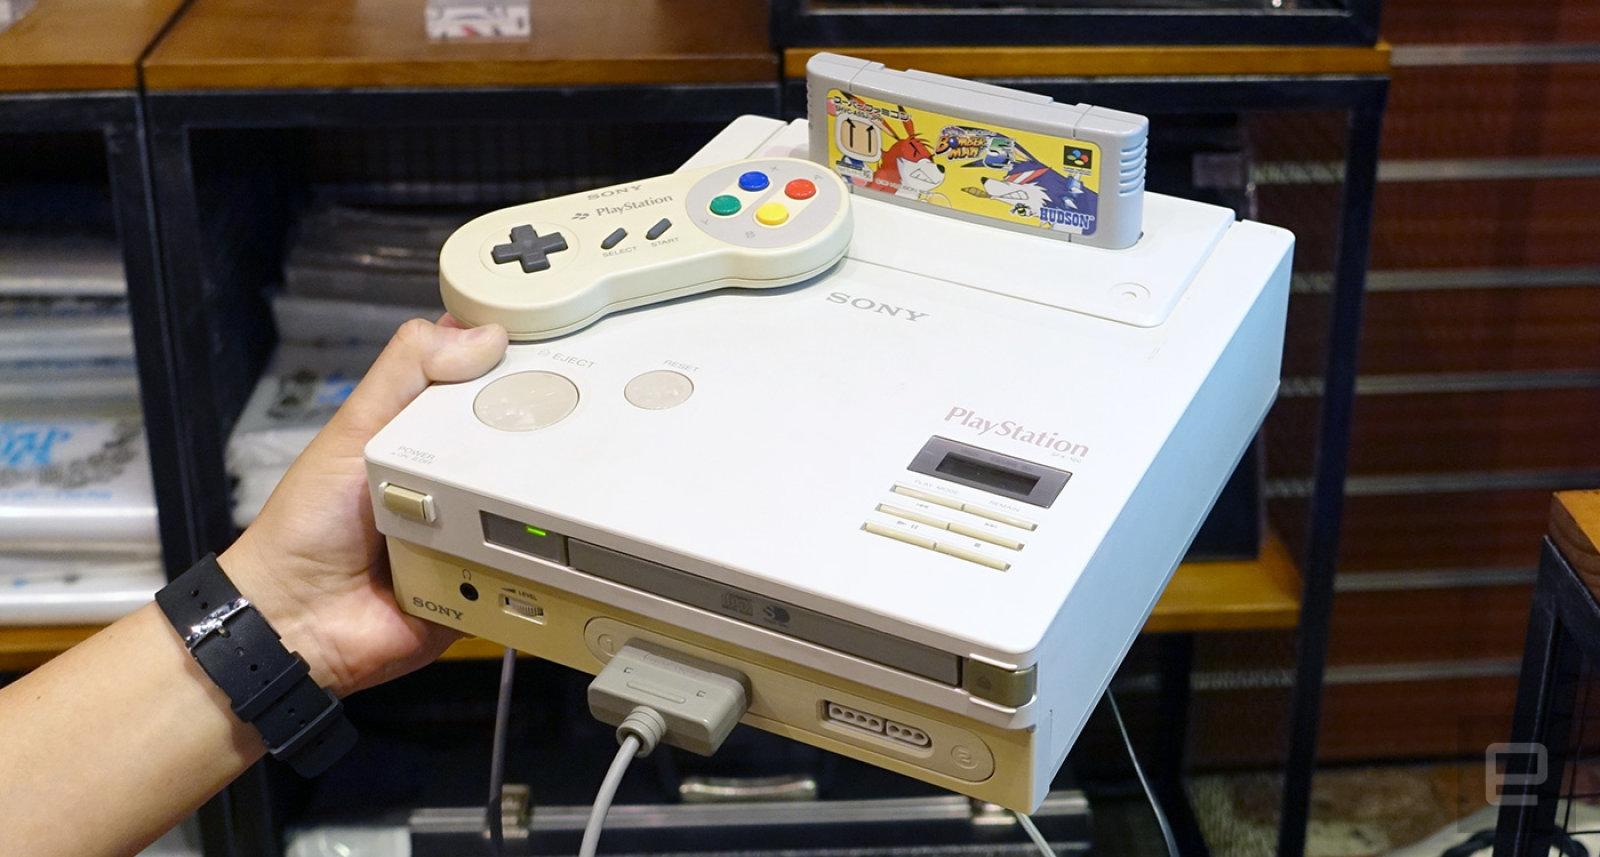 662bf543e2be6 幻の「任天堂プレイステーション」がCD-ROMゲームの起動に成功。著名ハッカーが解析&リペア - Engadget 日本版